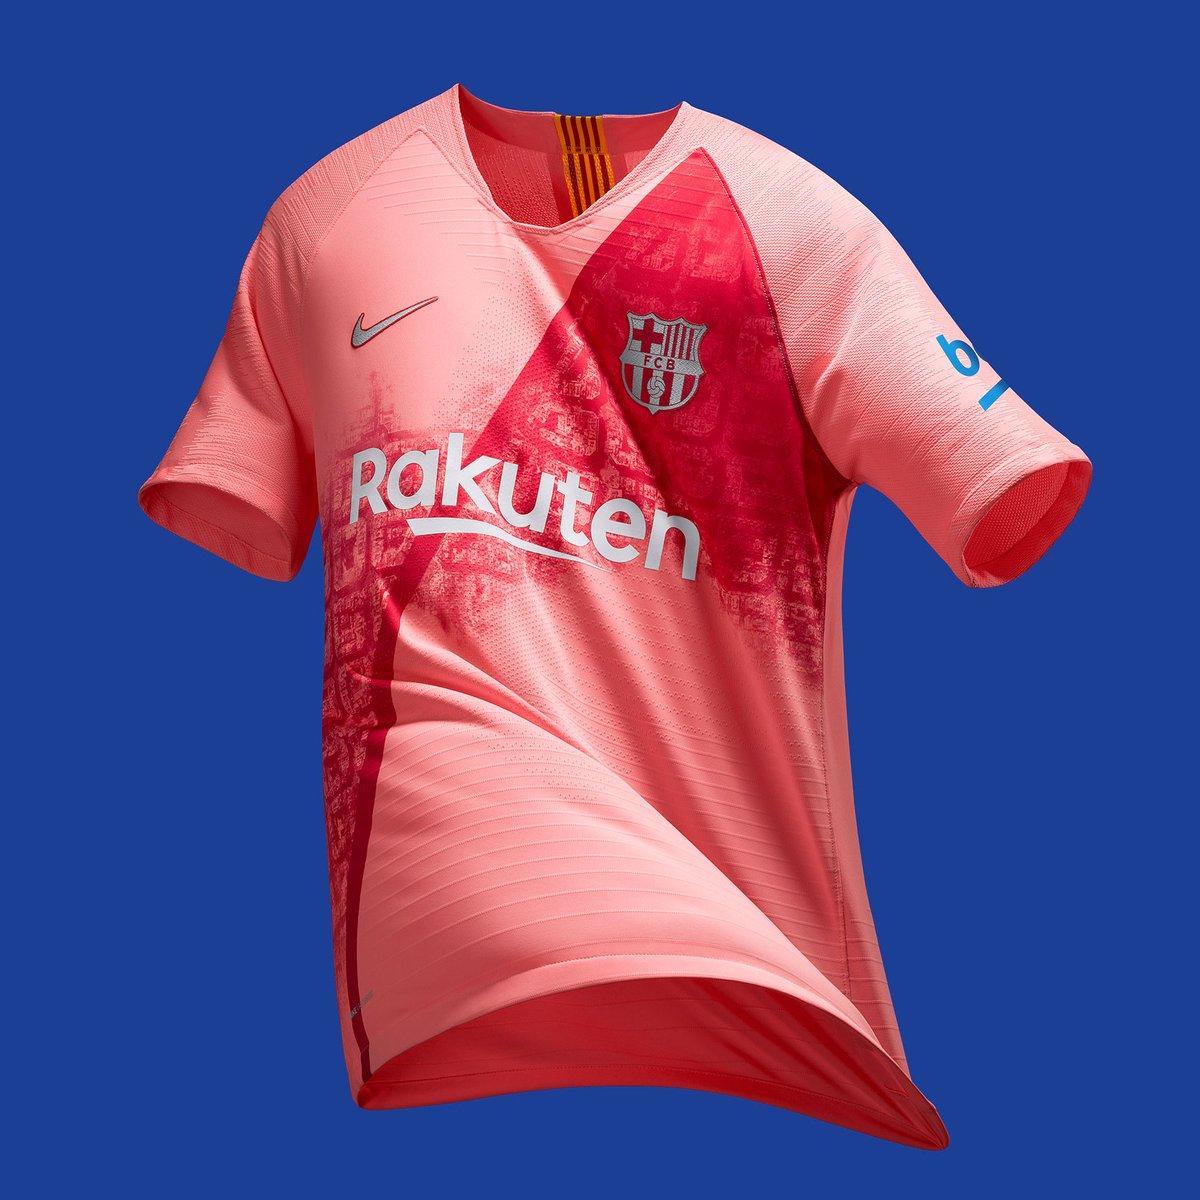 8c9e6c9003d Classic Football Shirts on Twitter